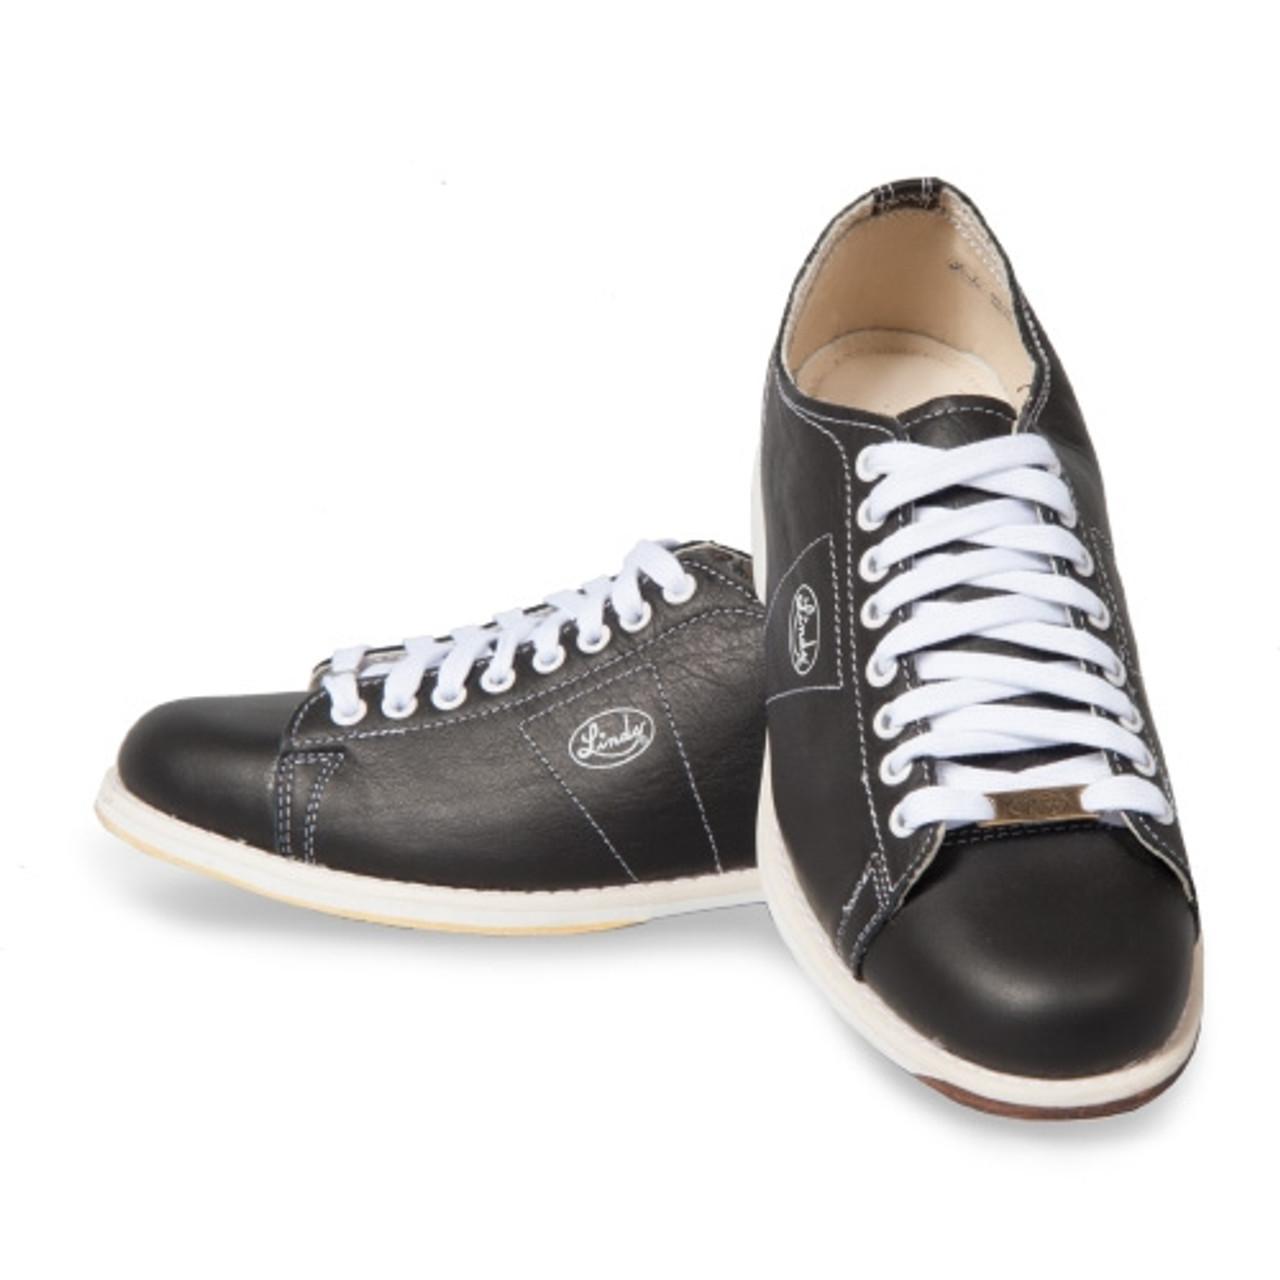 Linds Classic Mens Bowling Shoes Black